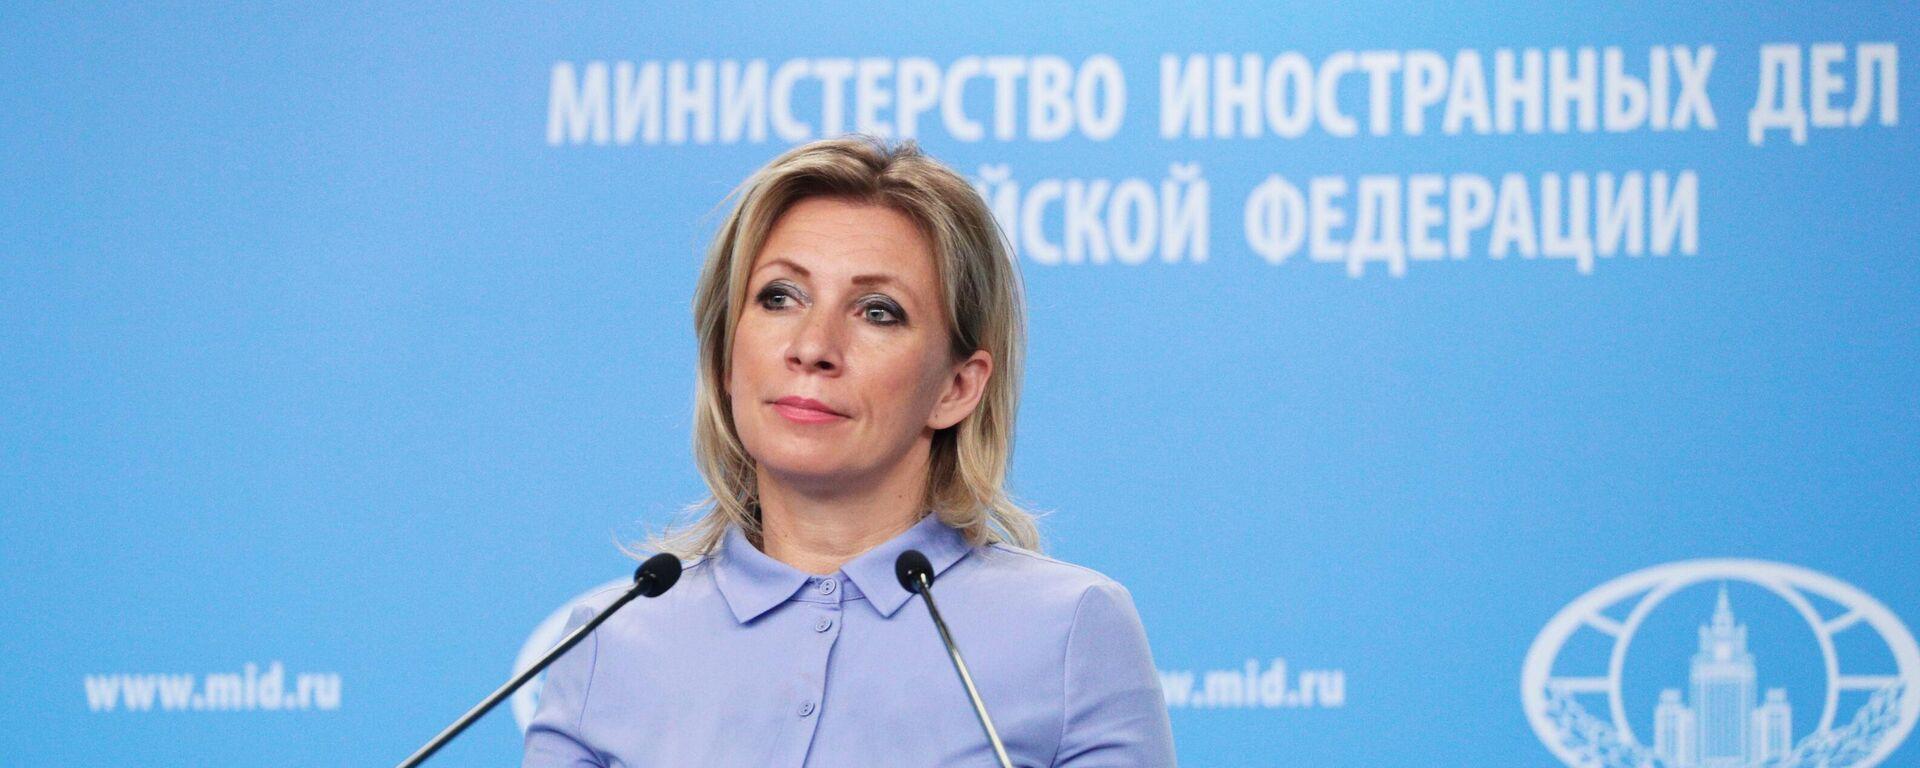 María Zajárova, portavoz del Ministerio de Exteriores ruso - Sputnik Mundo, 1920, 26.04.2021